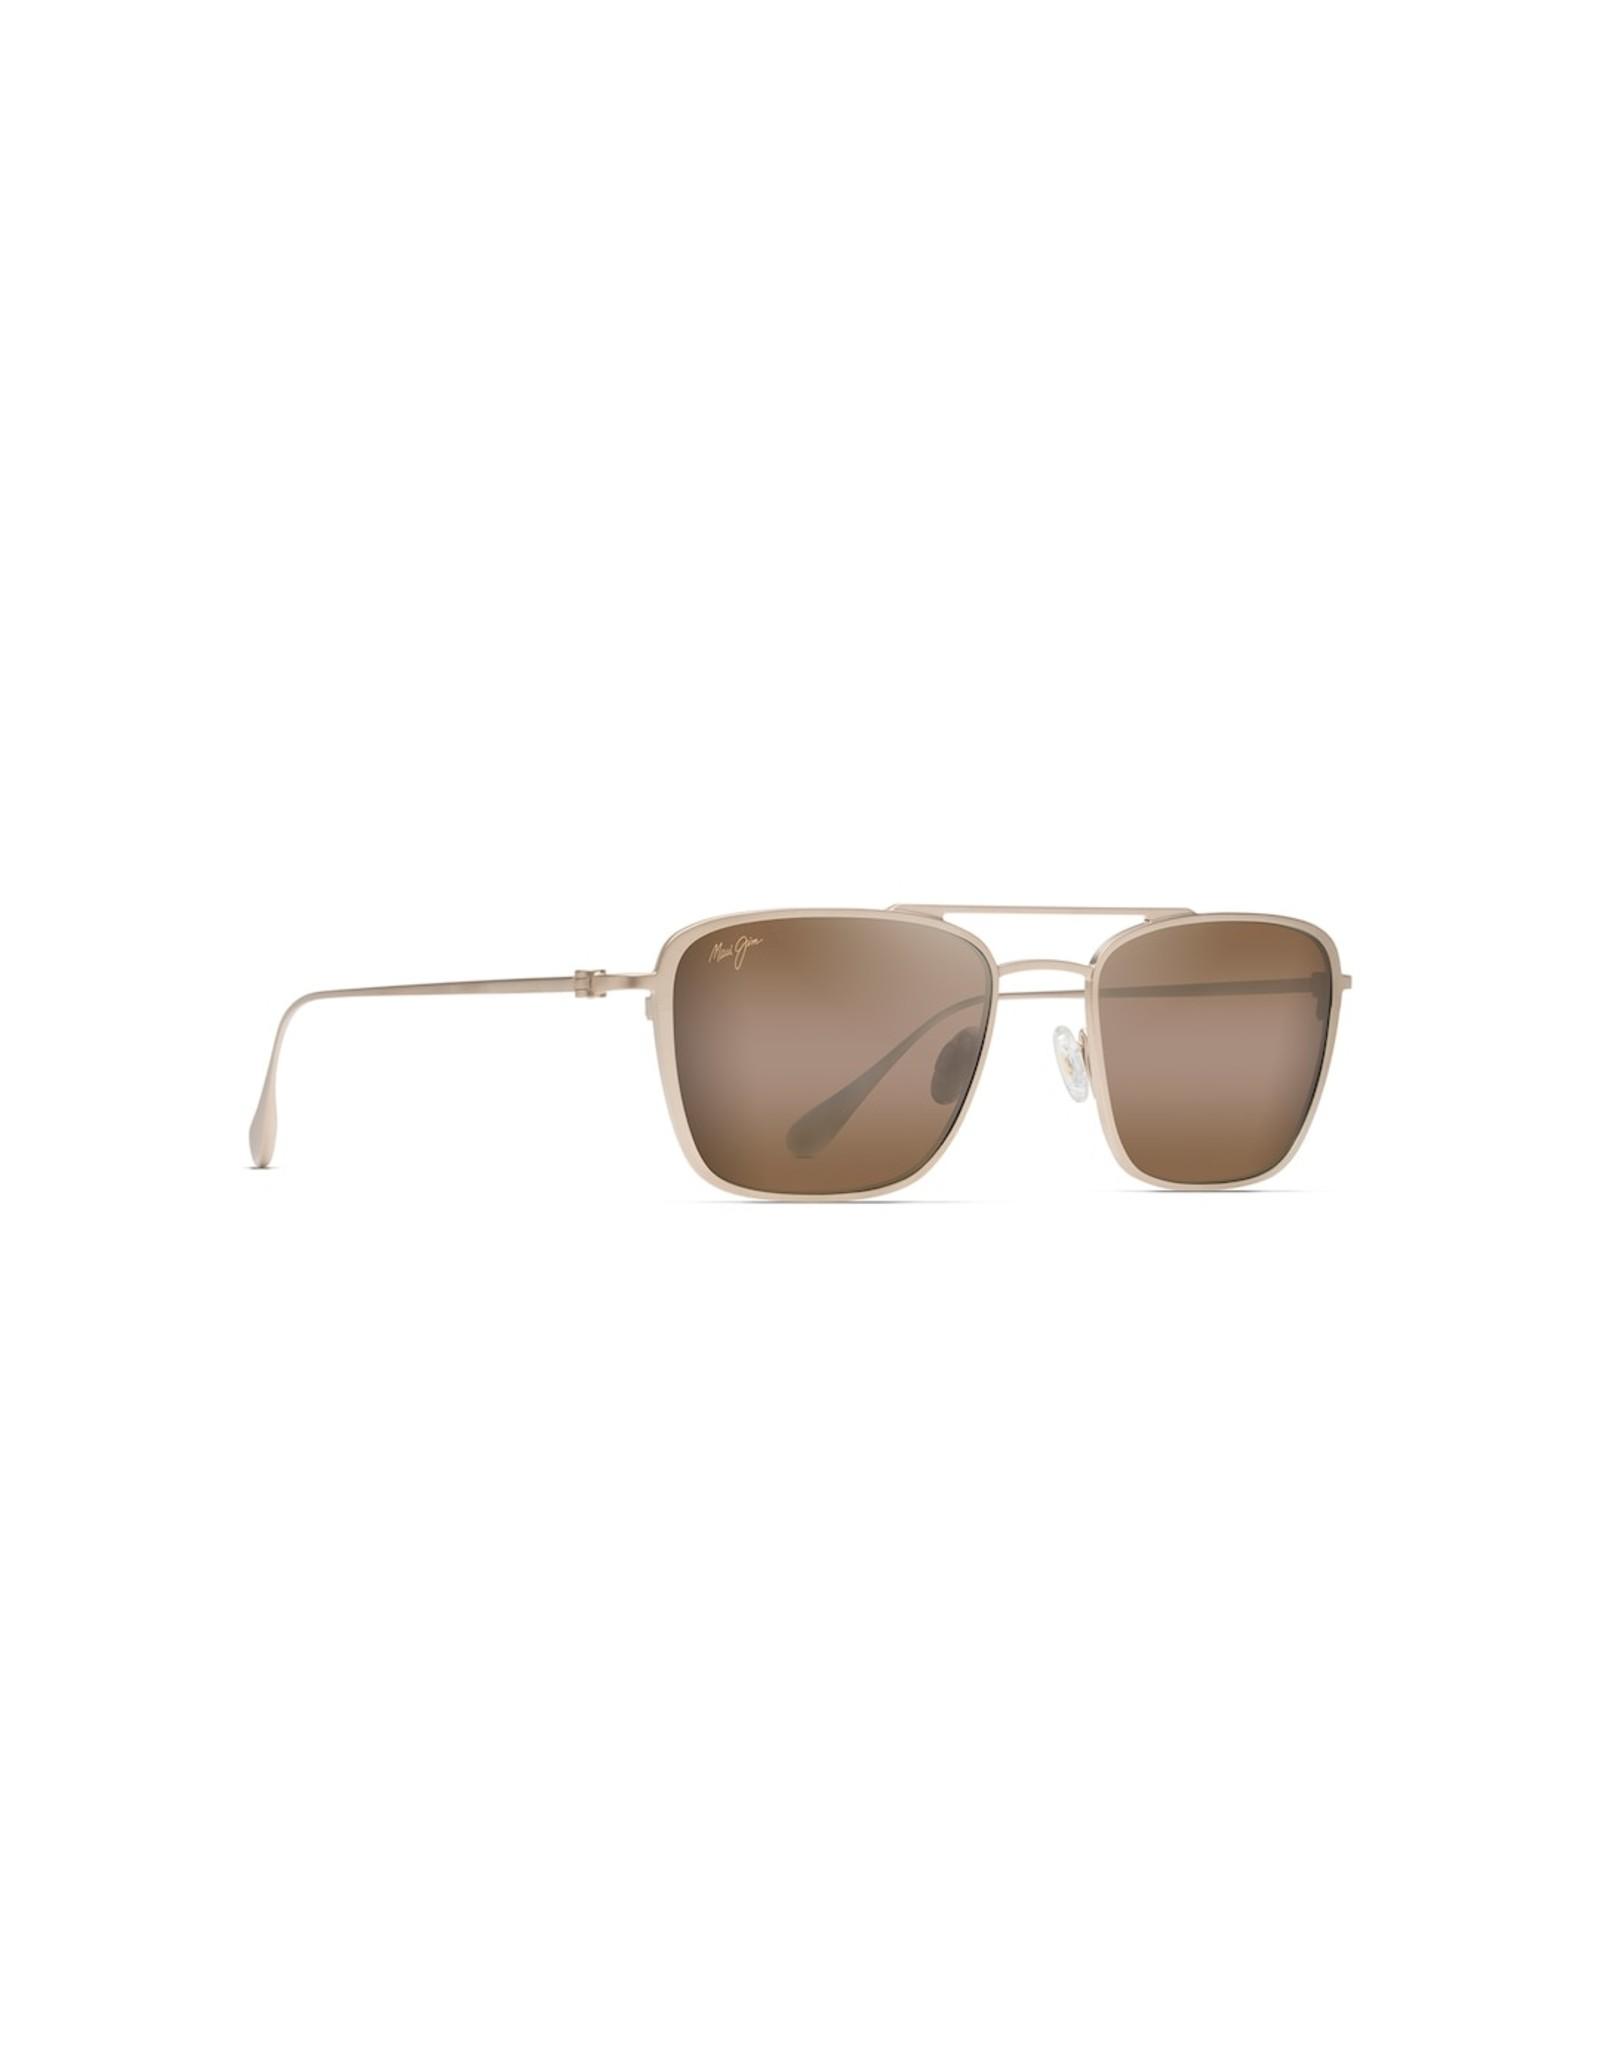 Maui Jim Maui Jim 'Ebb & Flow' Sunglasses